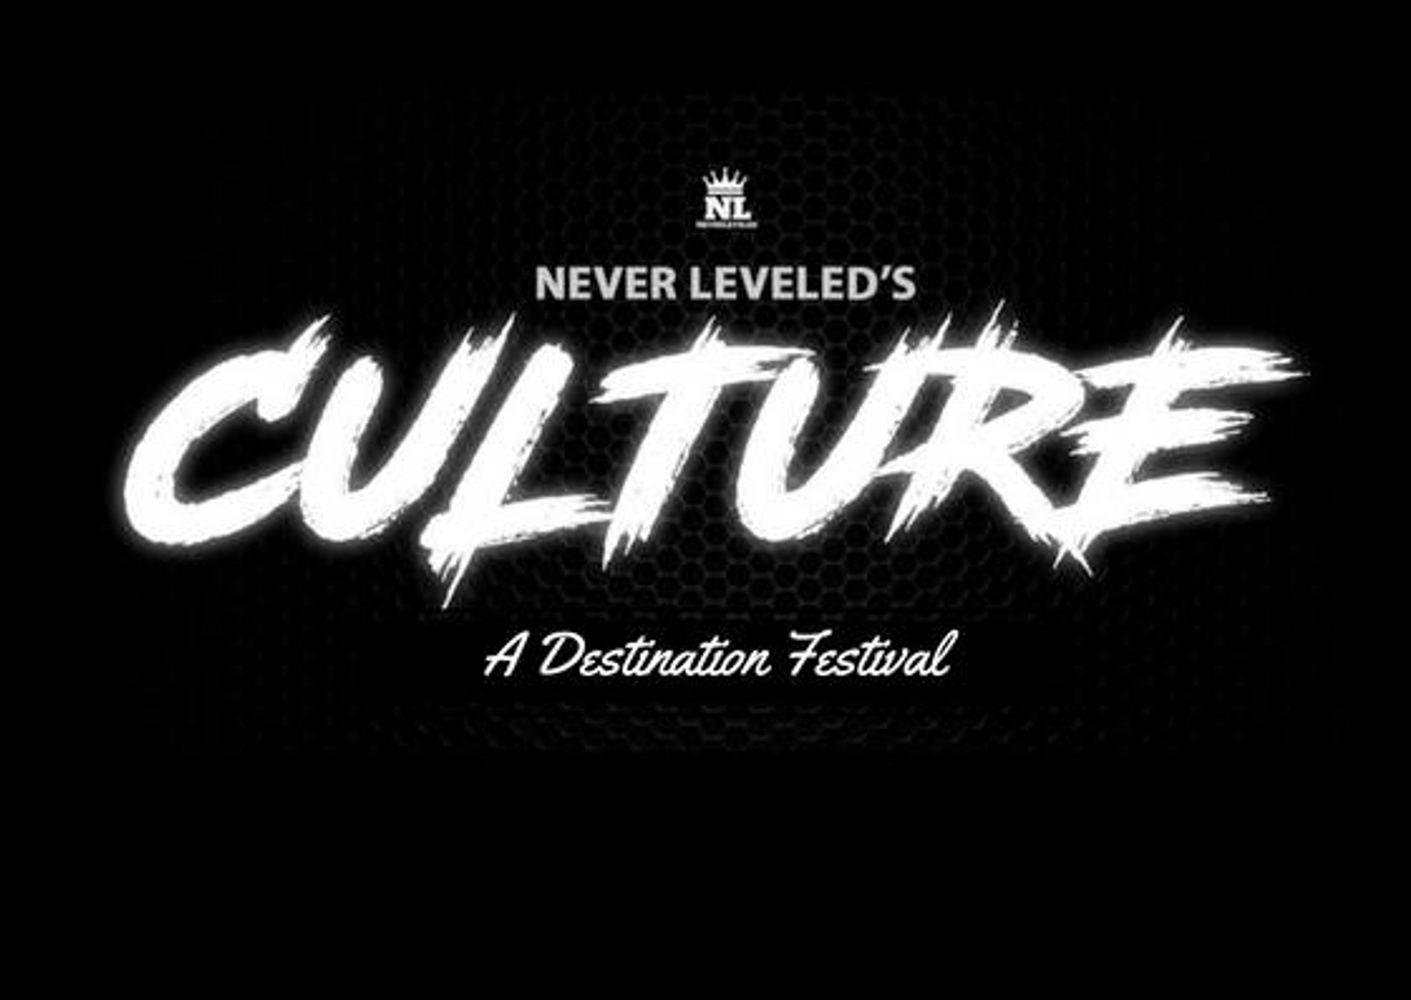 NeverLeveleds Culture A Destination Festival